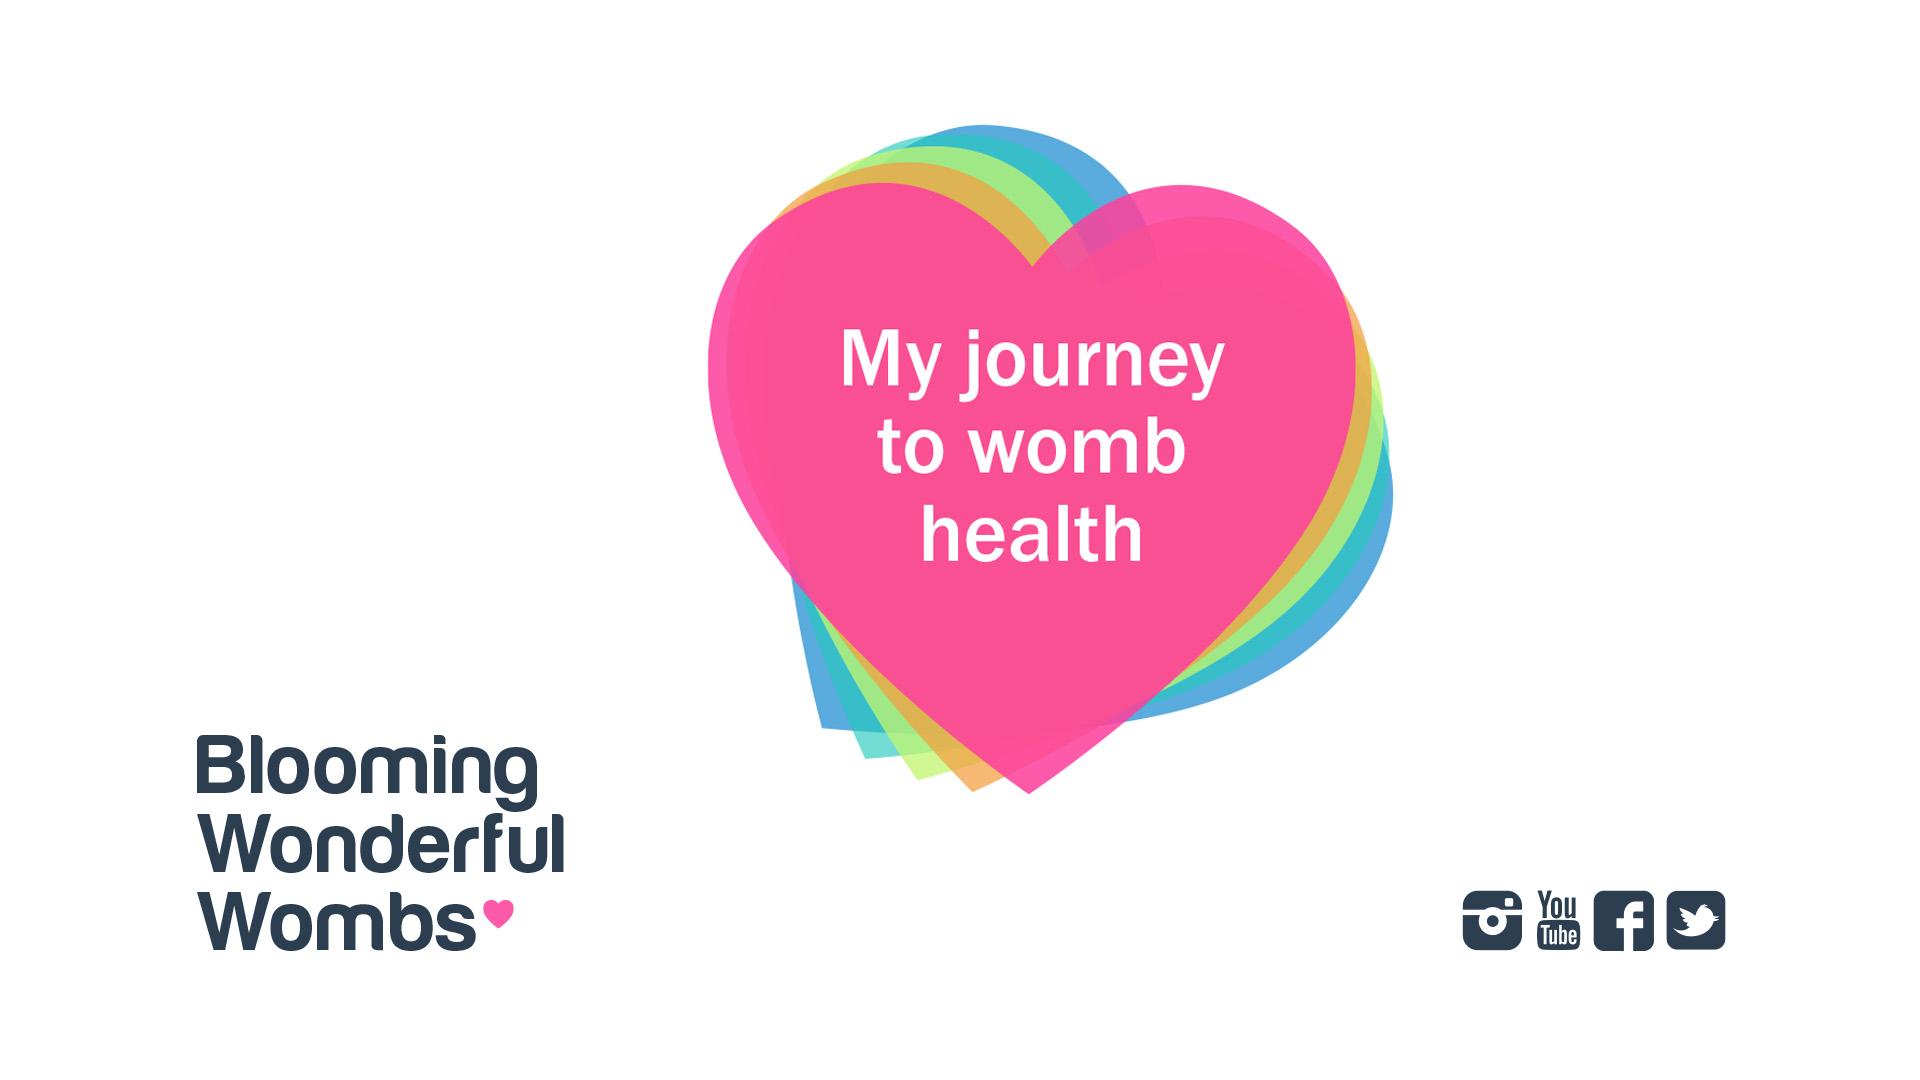 My journey to womb health